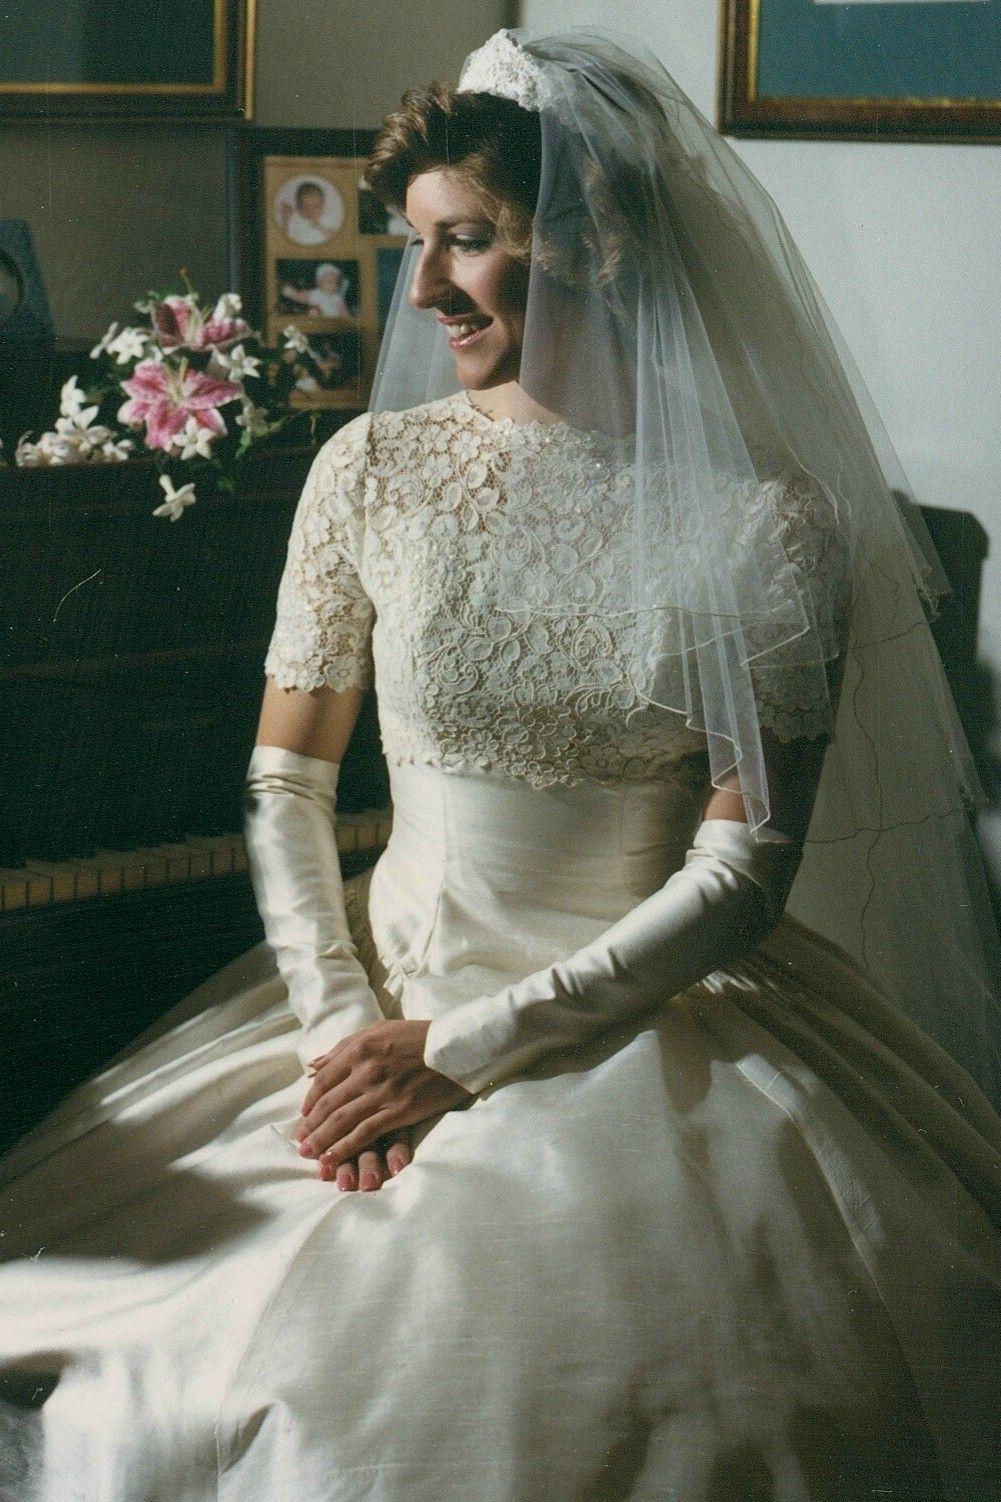 1955 Vintage Priscilla Of Boston Wedding Dress | Buy U0026 Sell Wedding Dresses,  Used Wedding